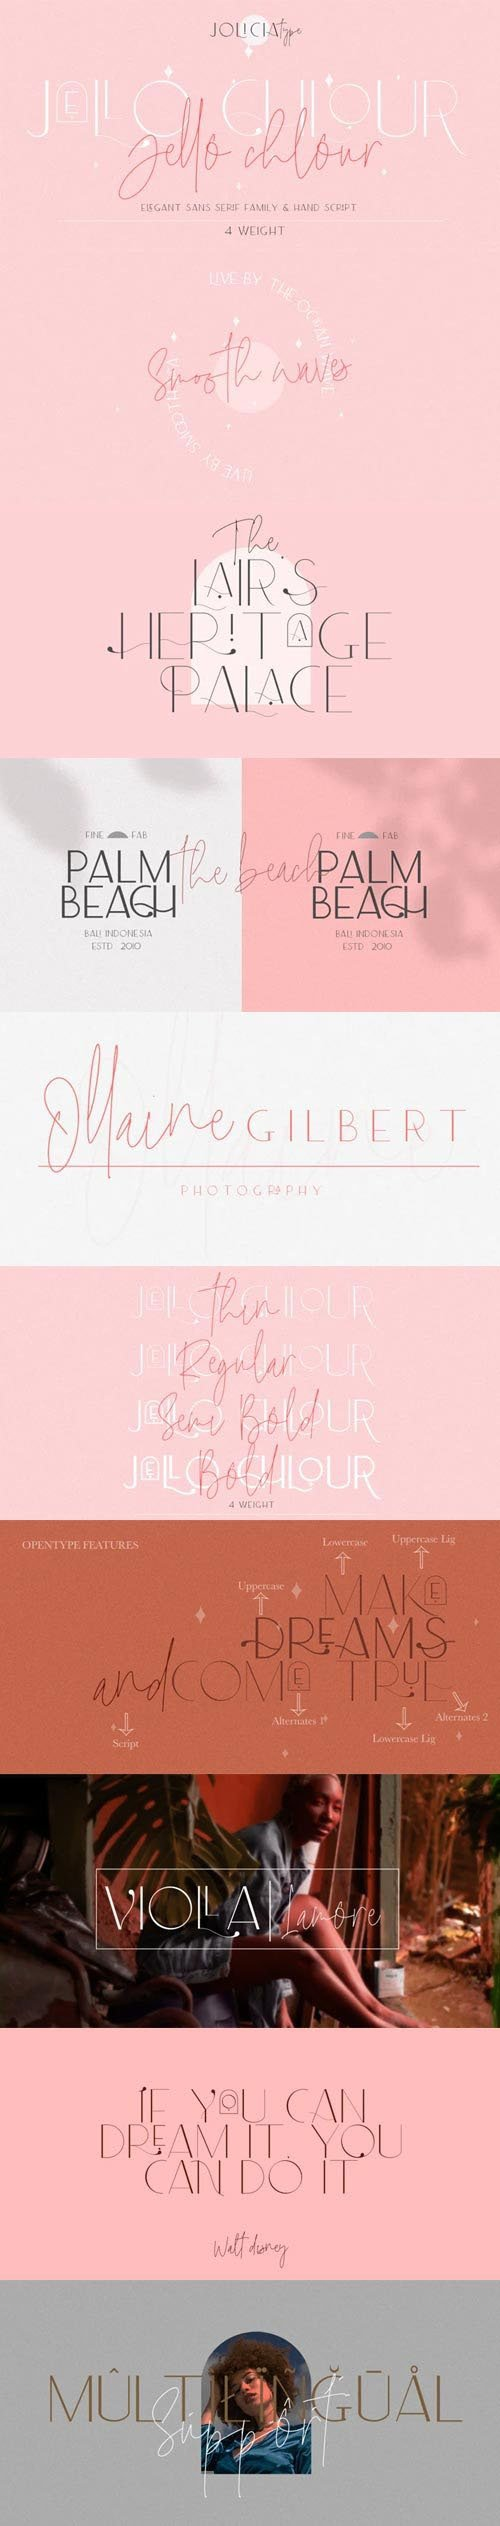 Jello Chlour Font Family